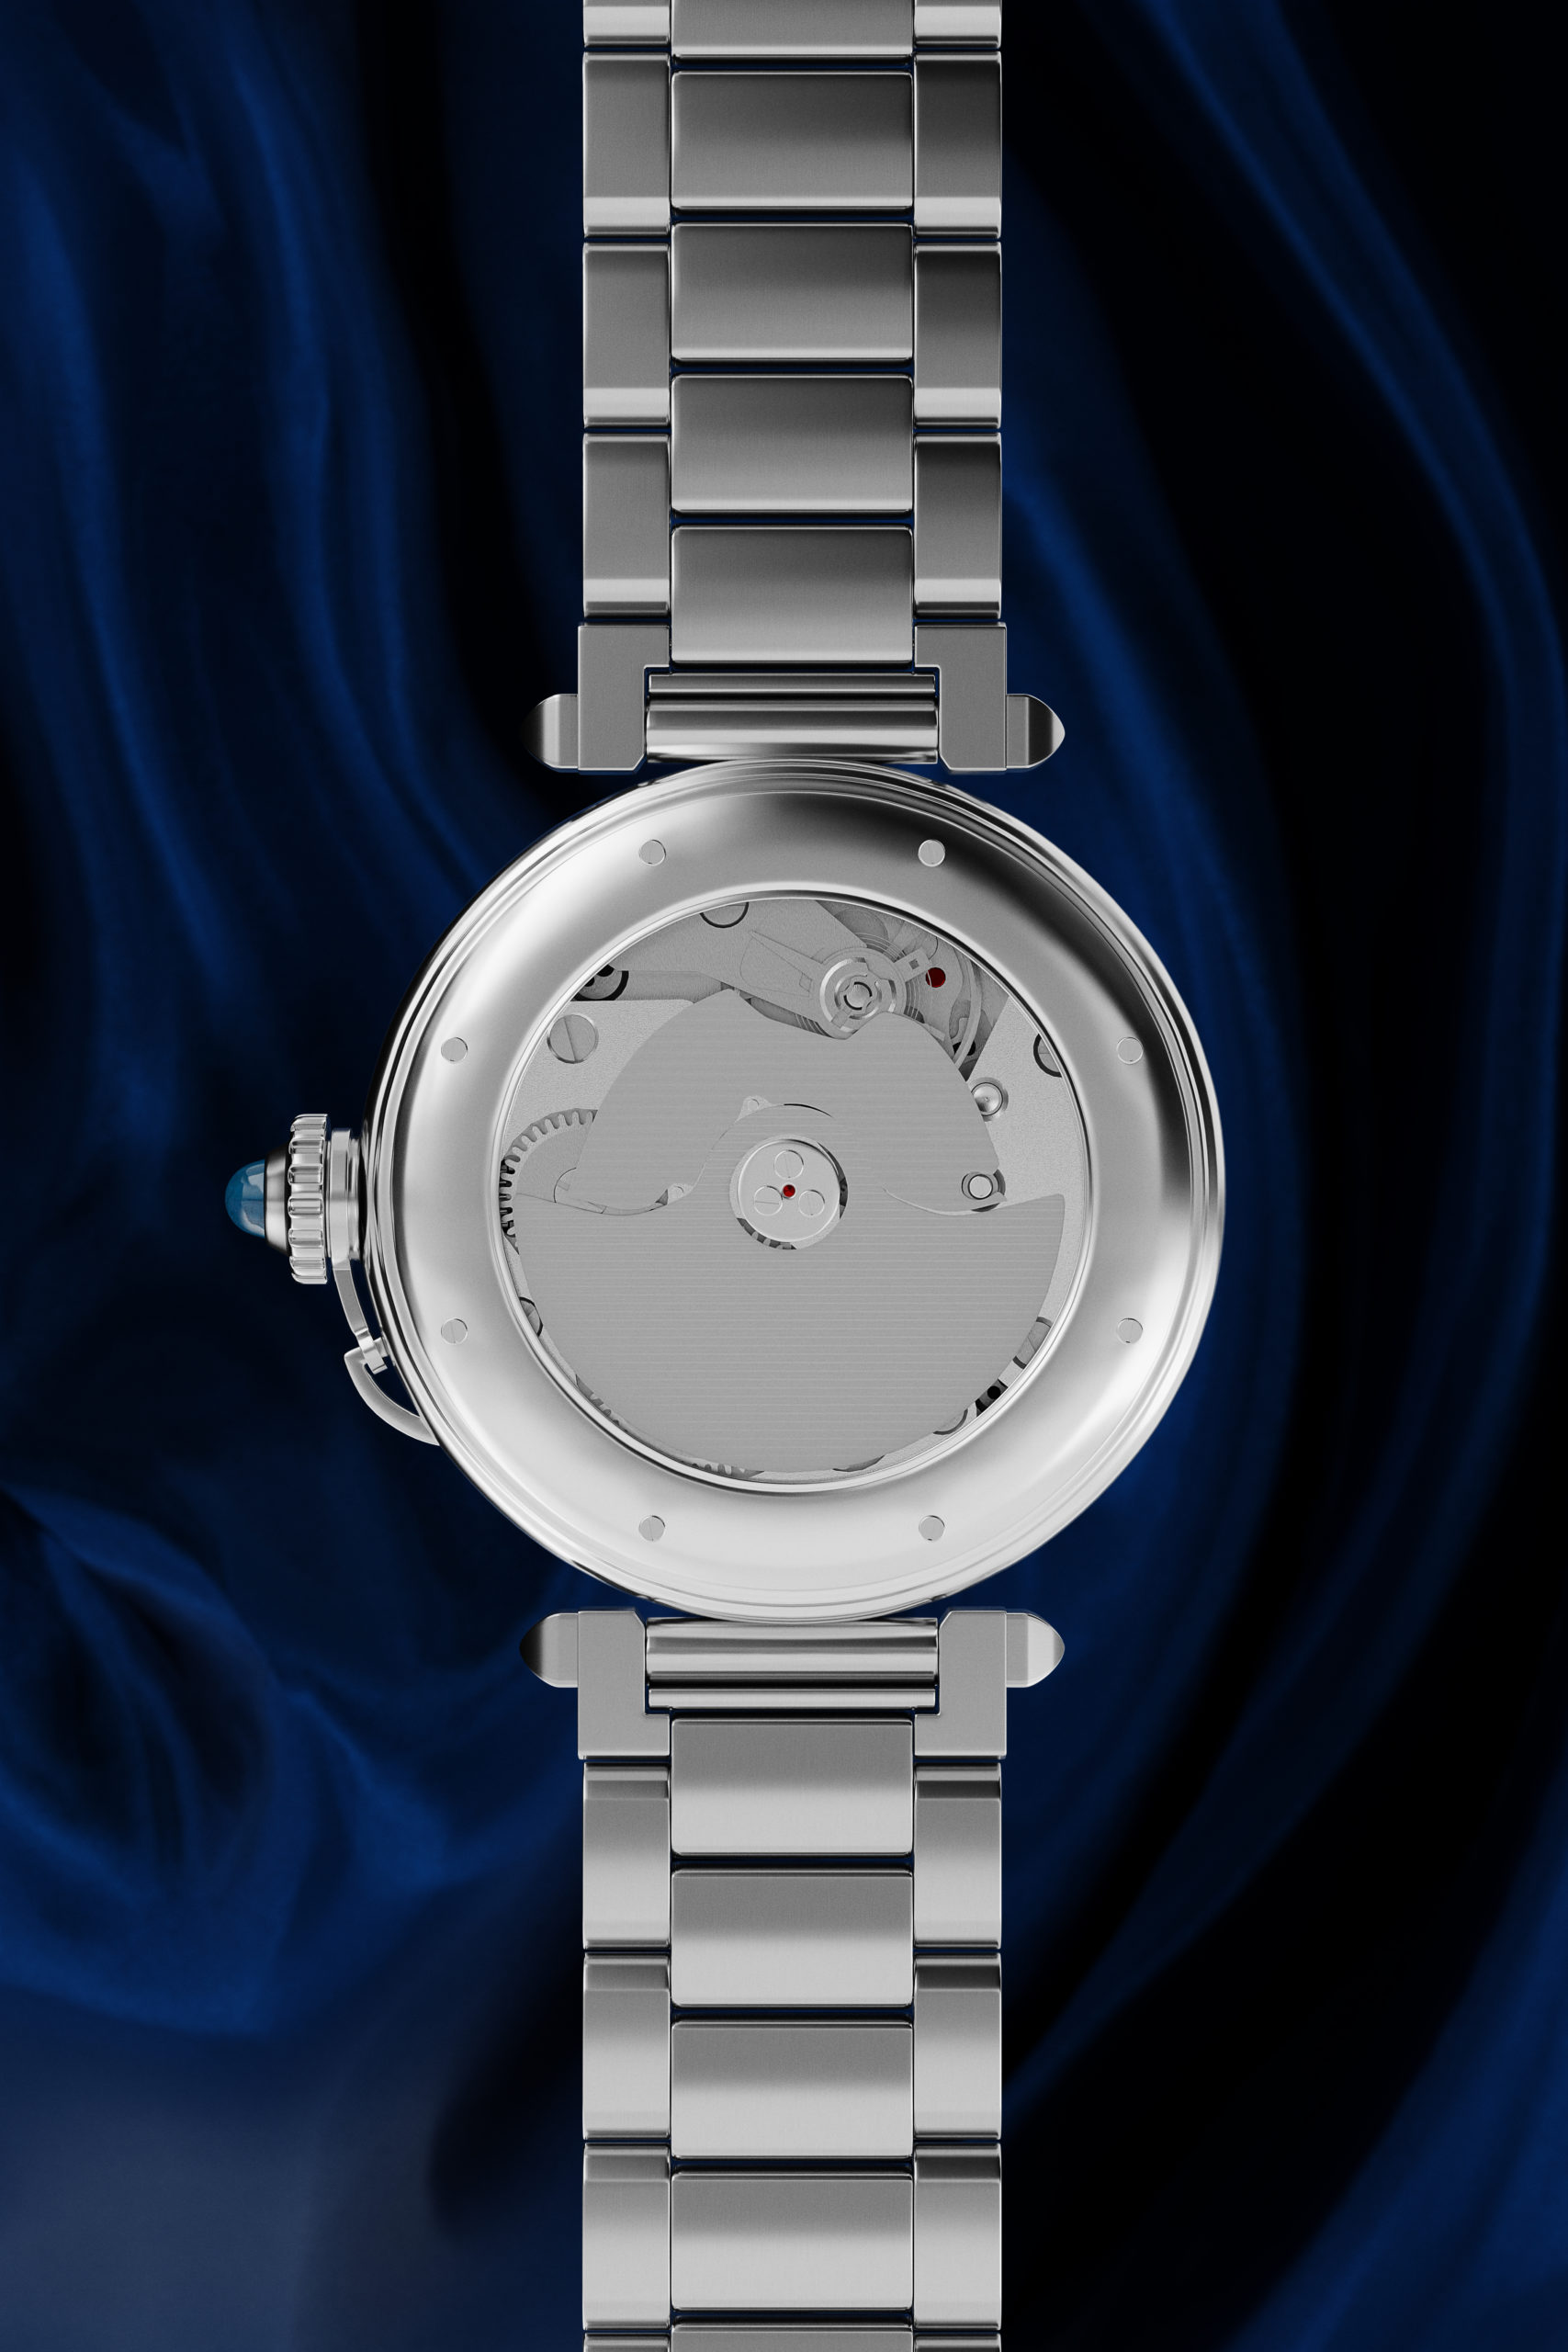 Wenbo Zhao-CGI Luxury Watch-Back Face with dark blue silk background